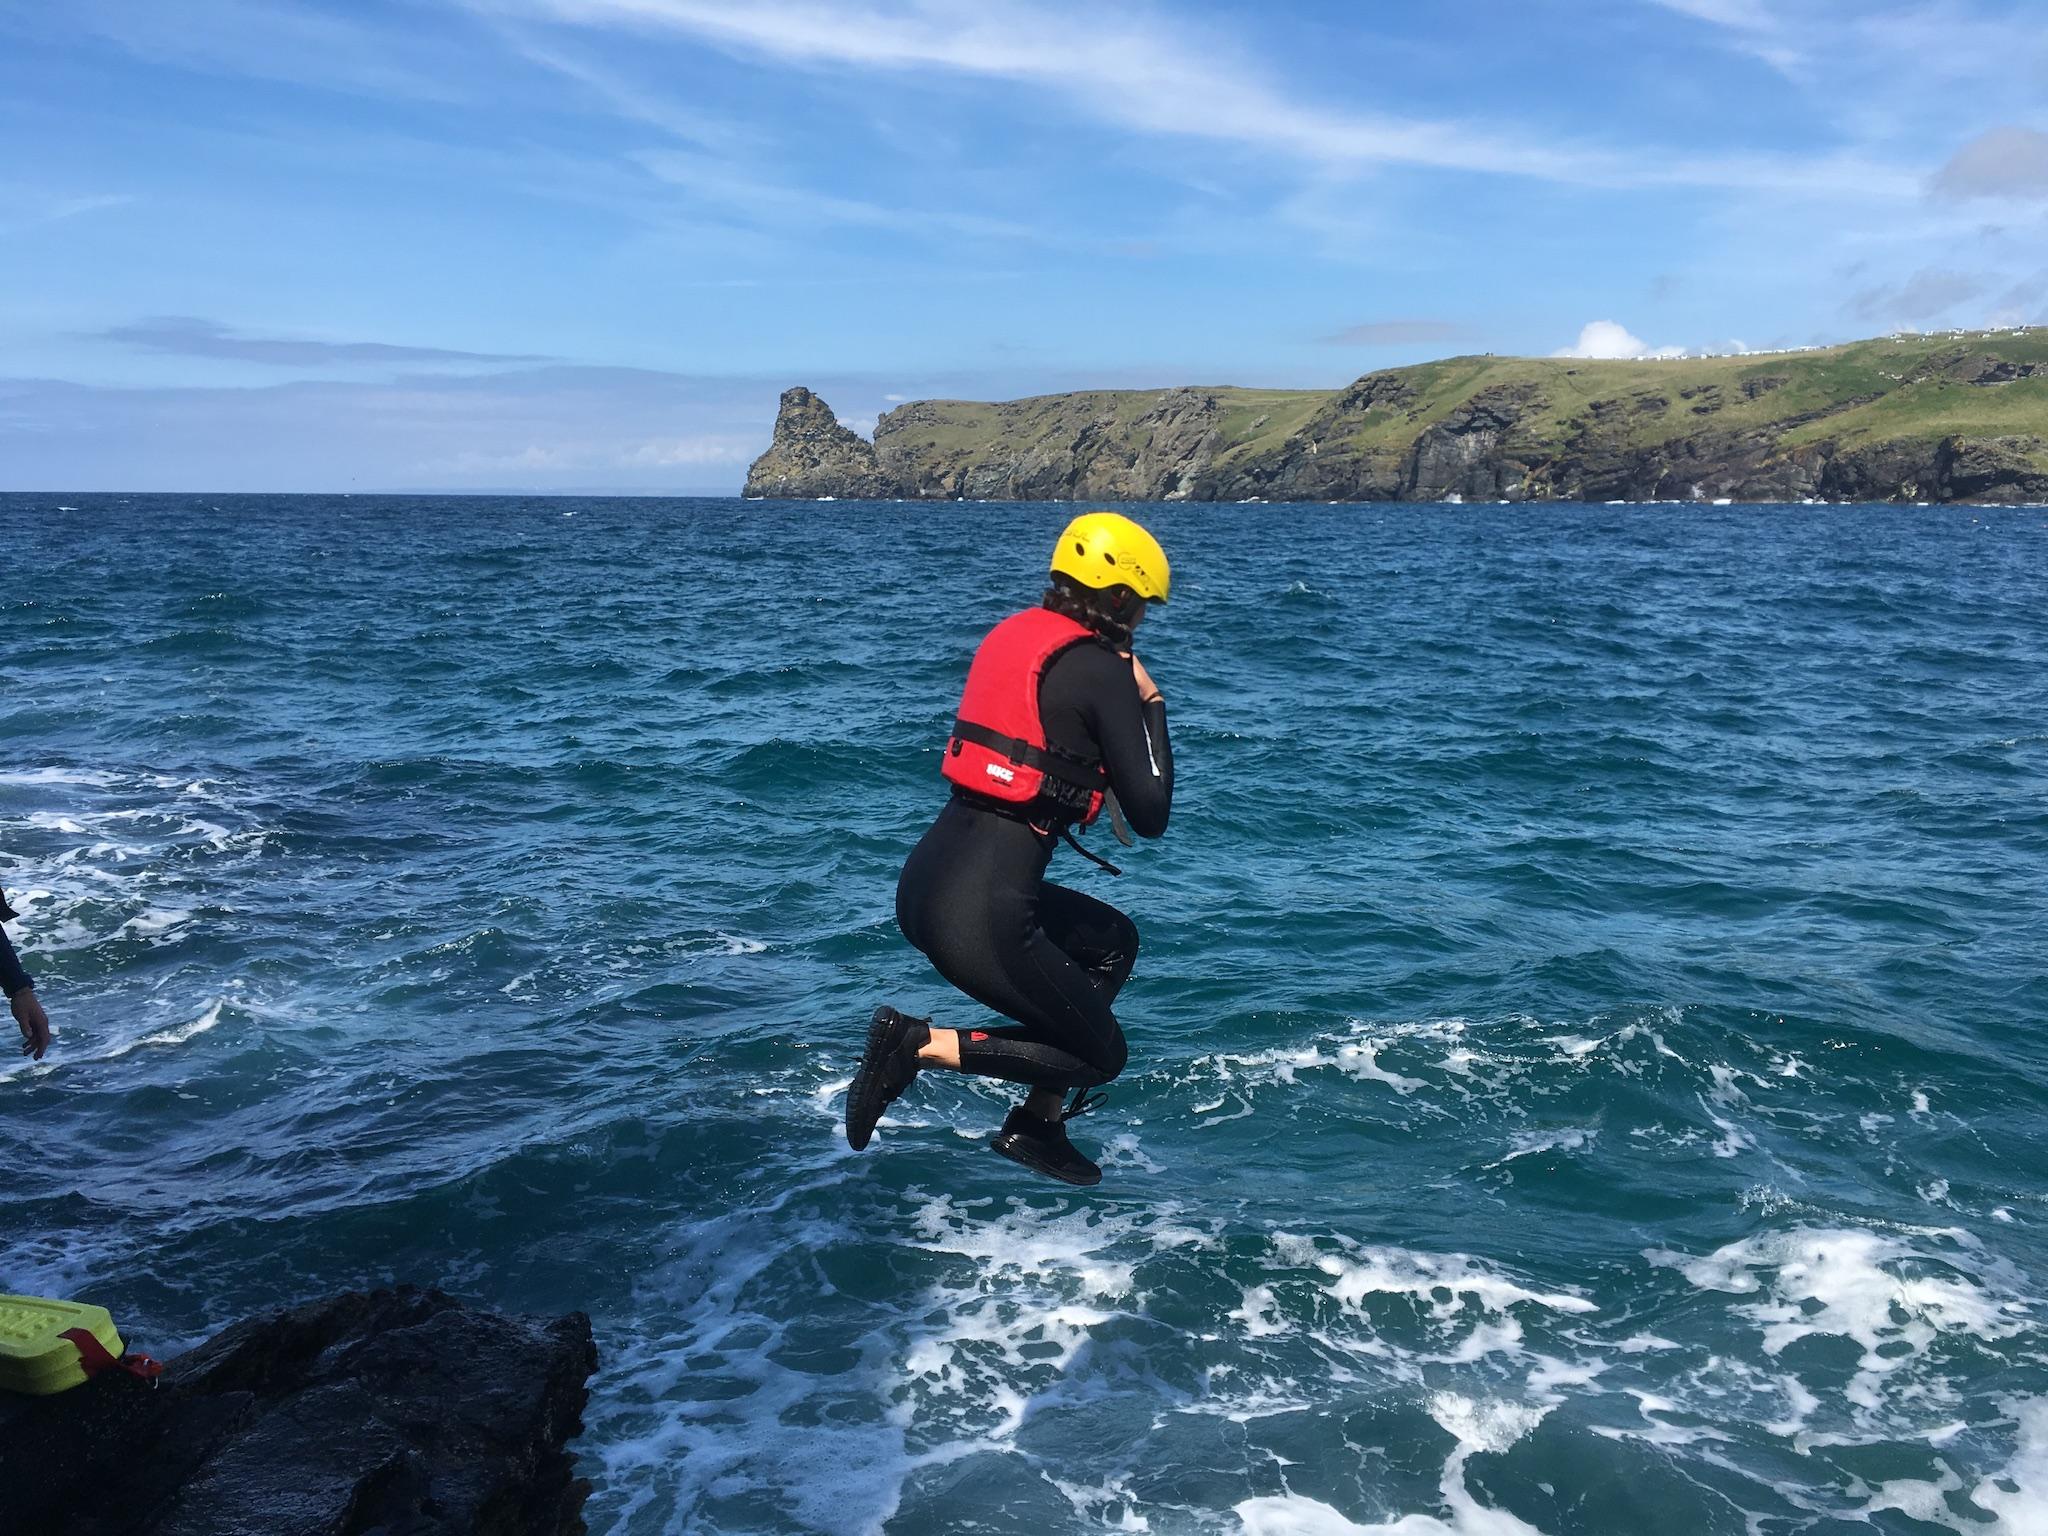 Cornwall coasteering experience near Widemouth Bay and Bude